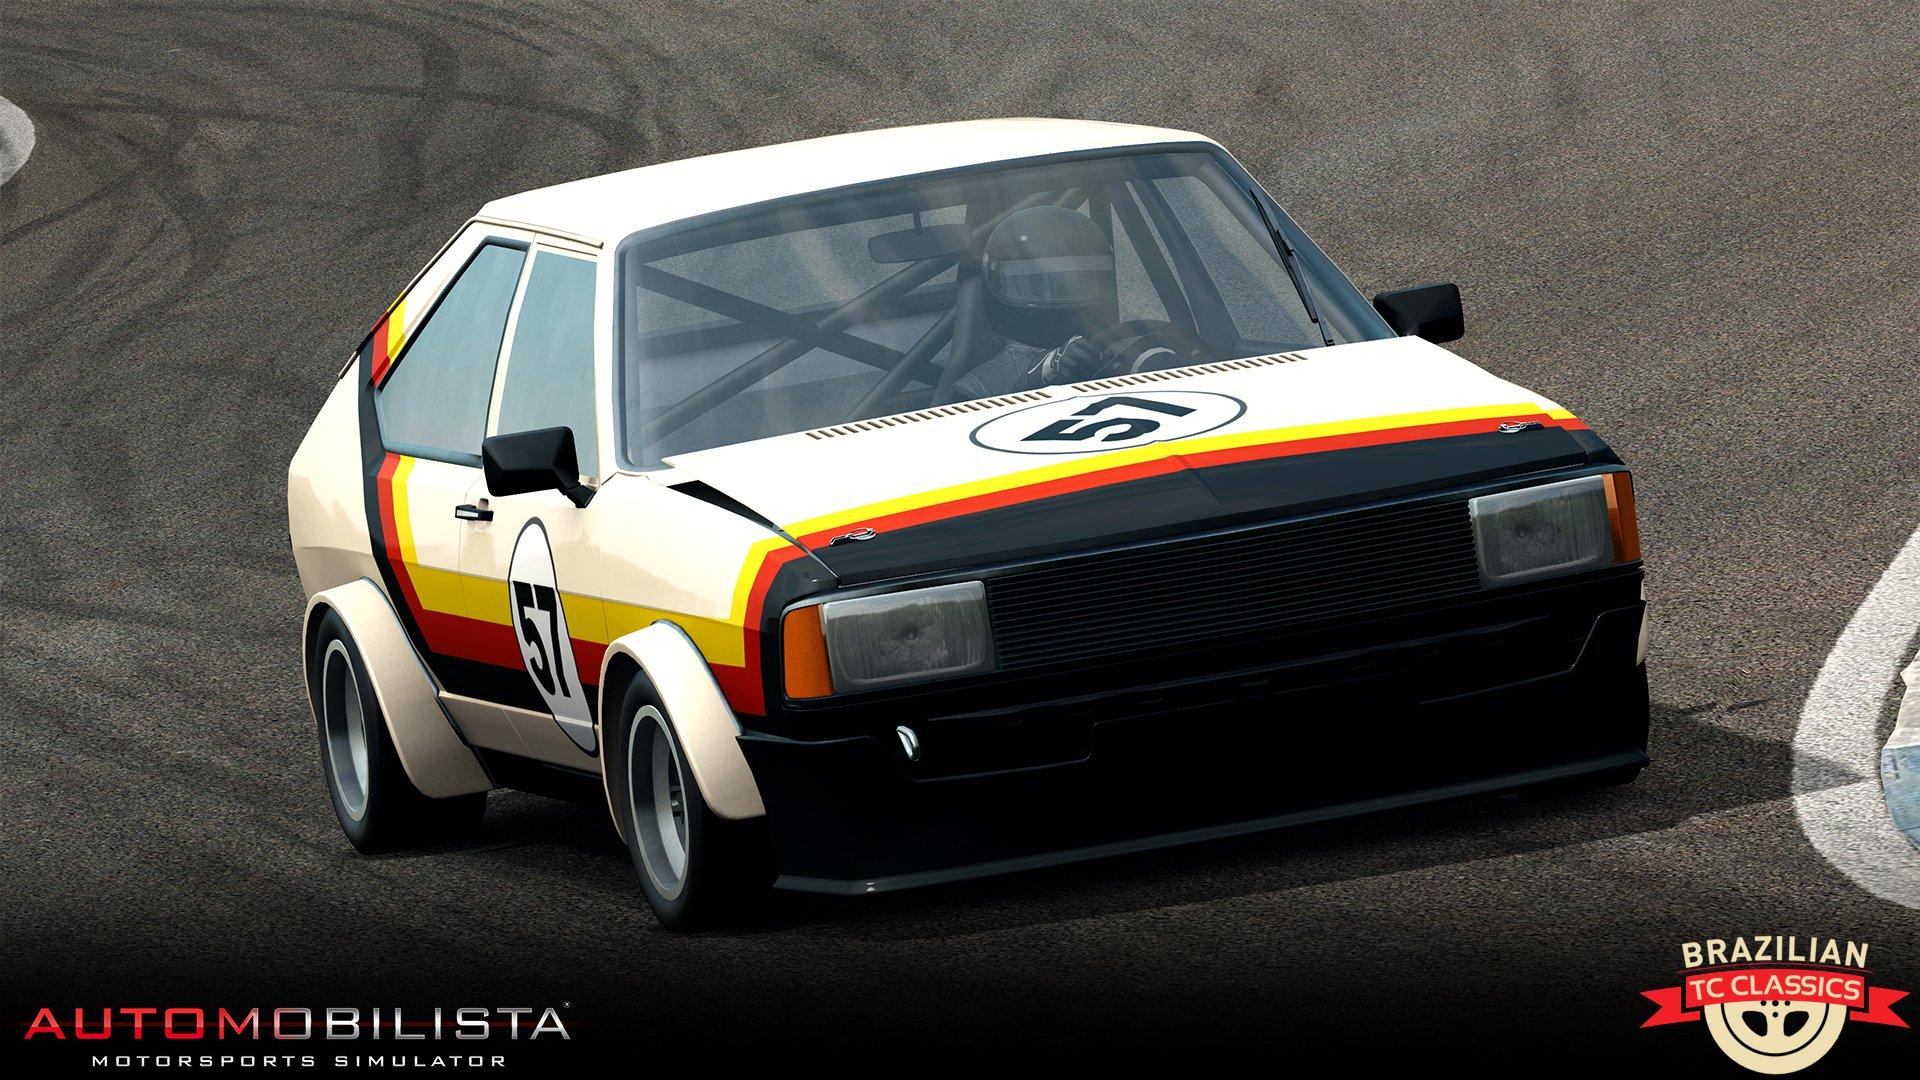 Automobilista Brazilian Touring Car Classics Steam Screenshot 10